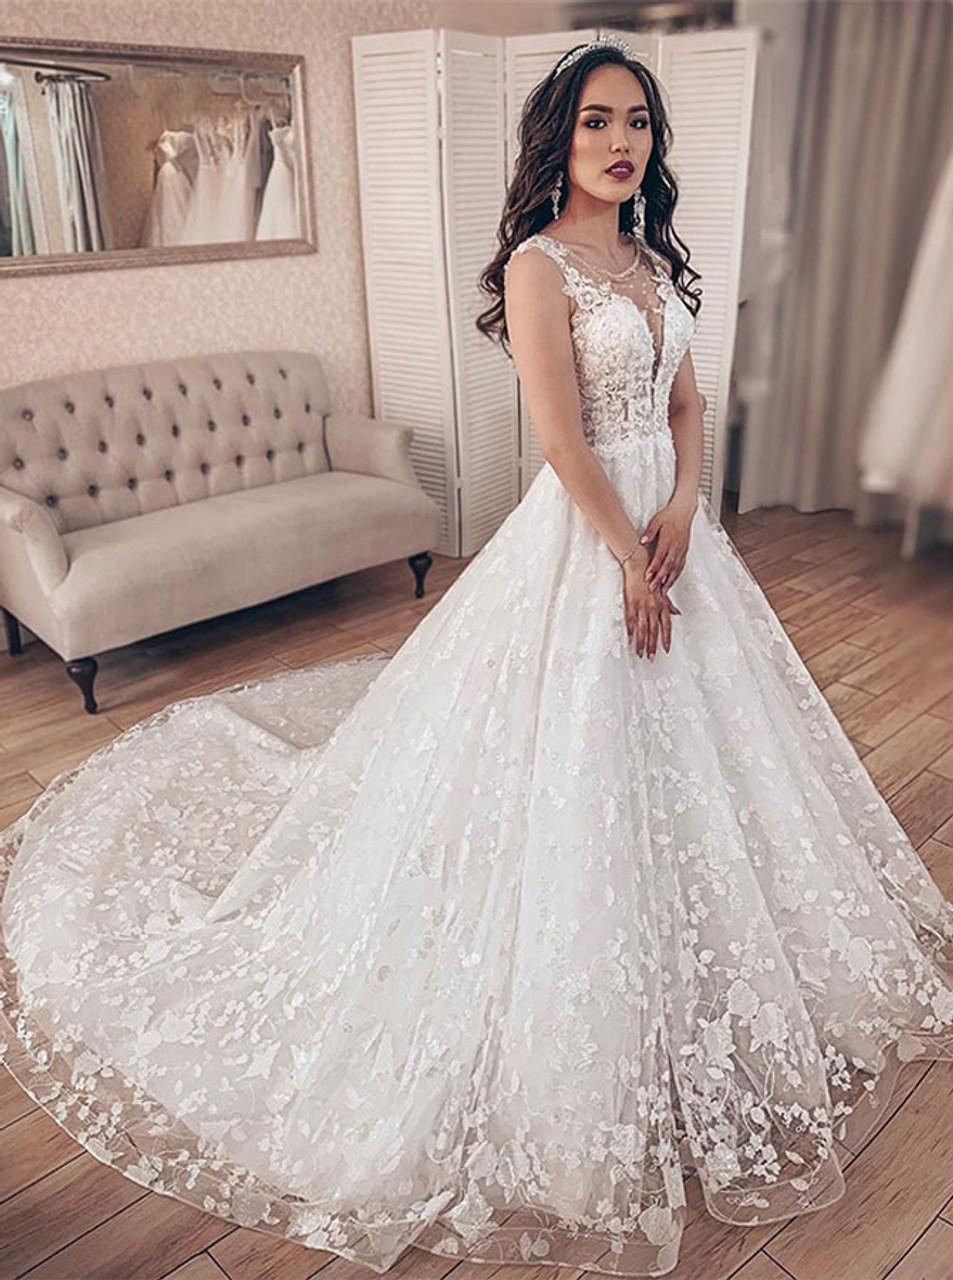 Princess Lace Wedding Dress,Stunning Bridal Gown,20